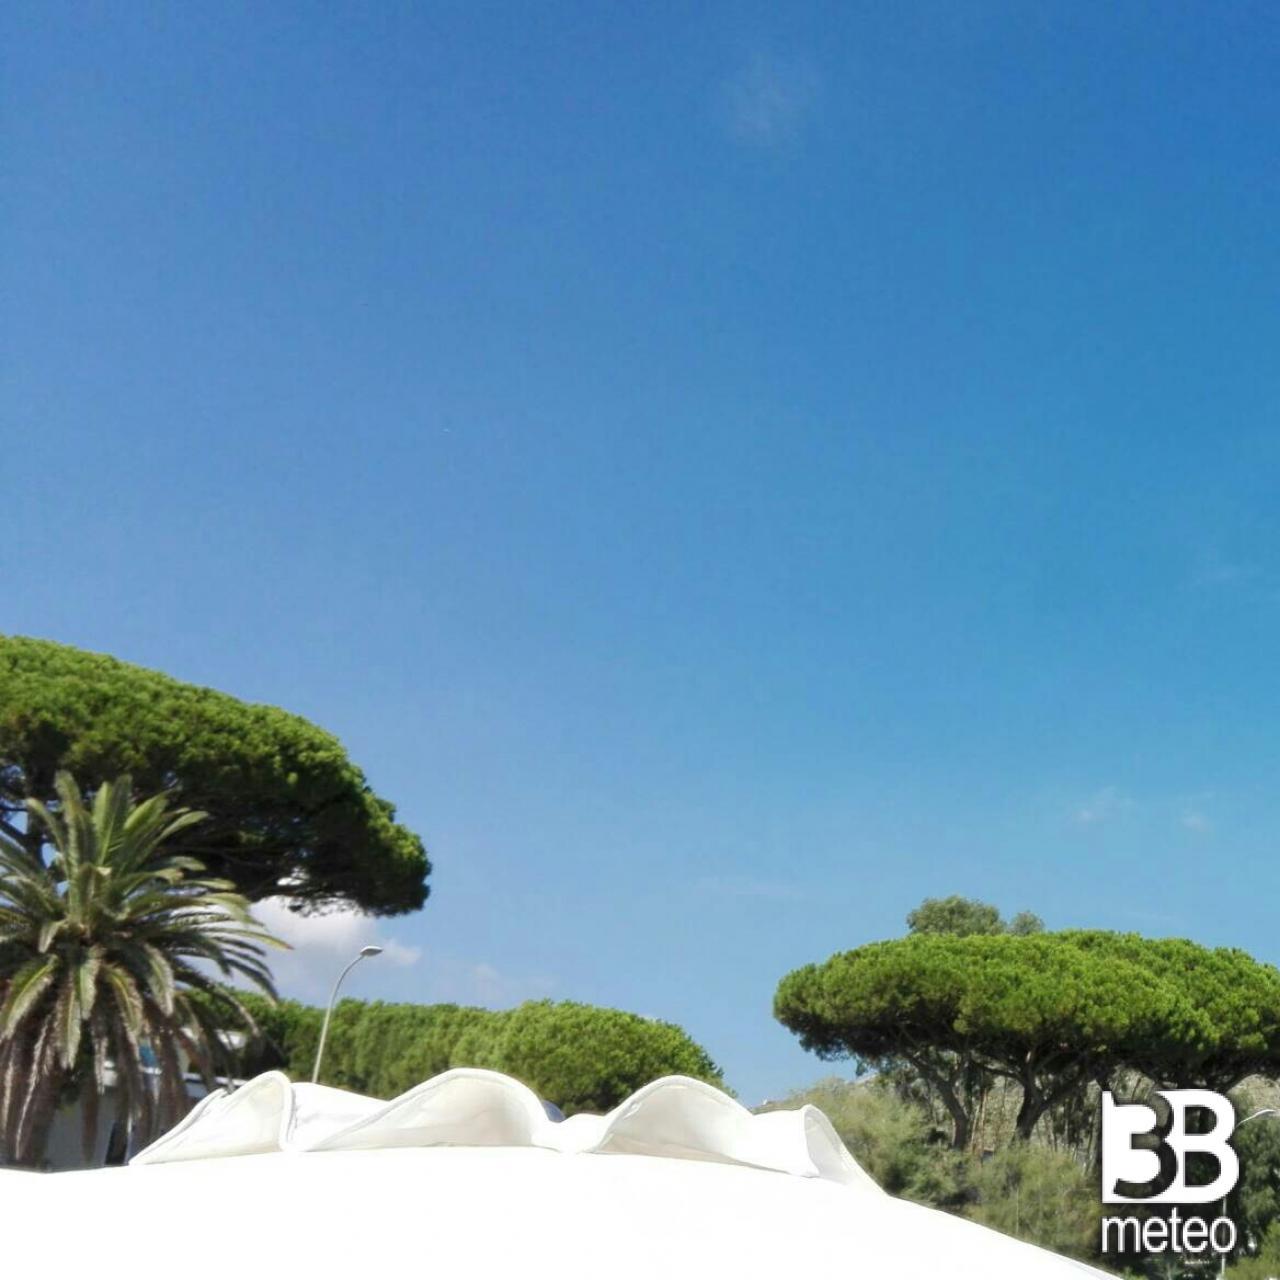 Fotosegnalazione di terracina foto gallery 3b meteo - 3b meteo bagno di romagna ...